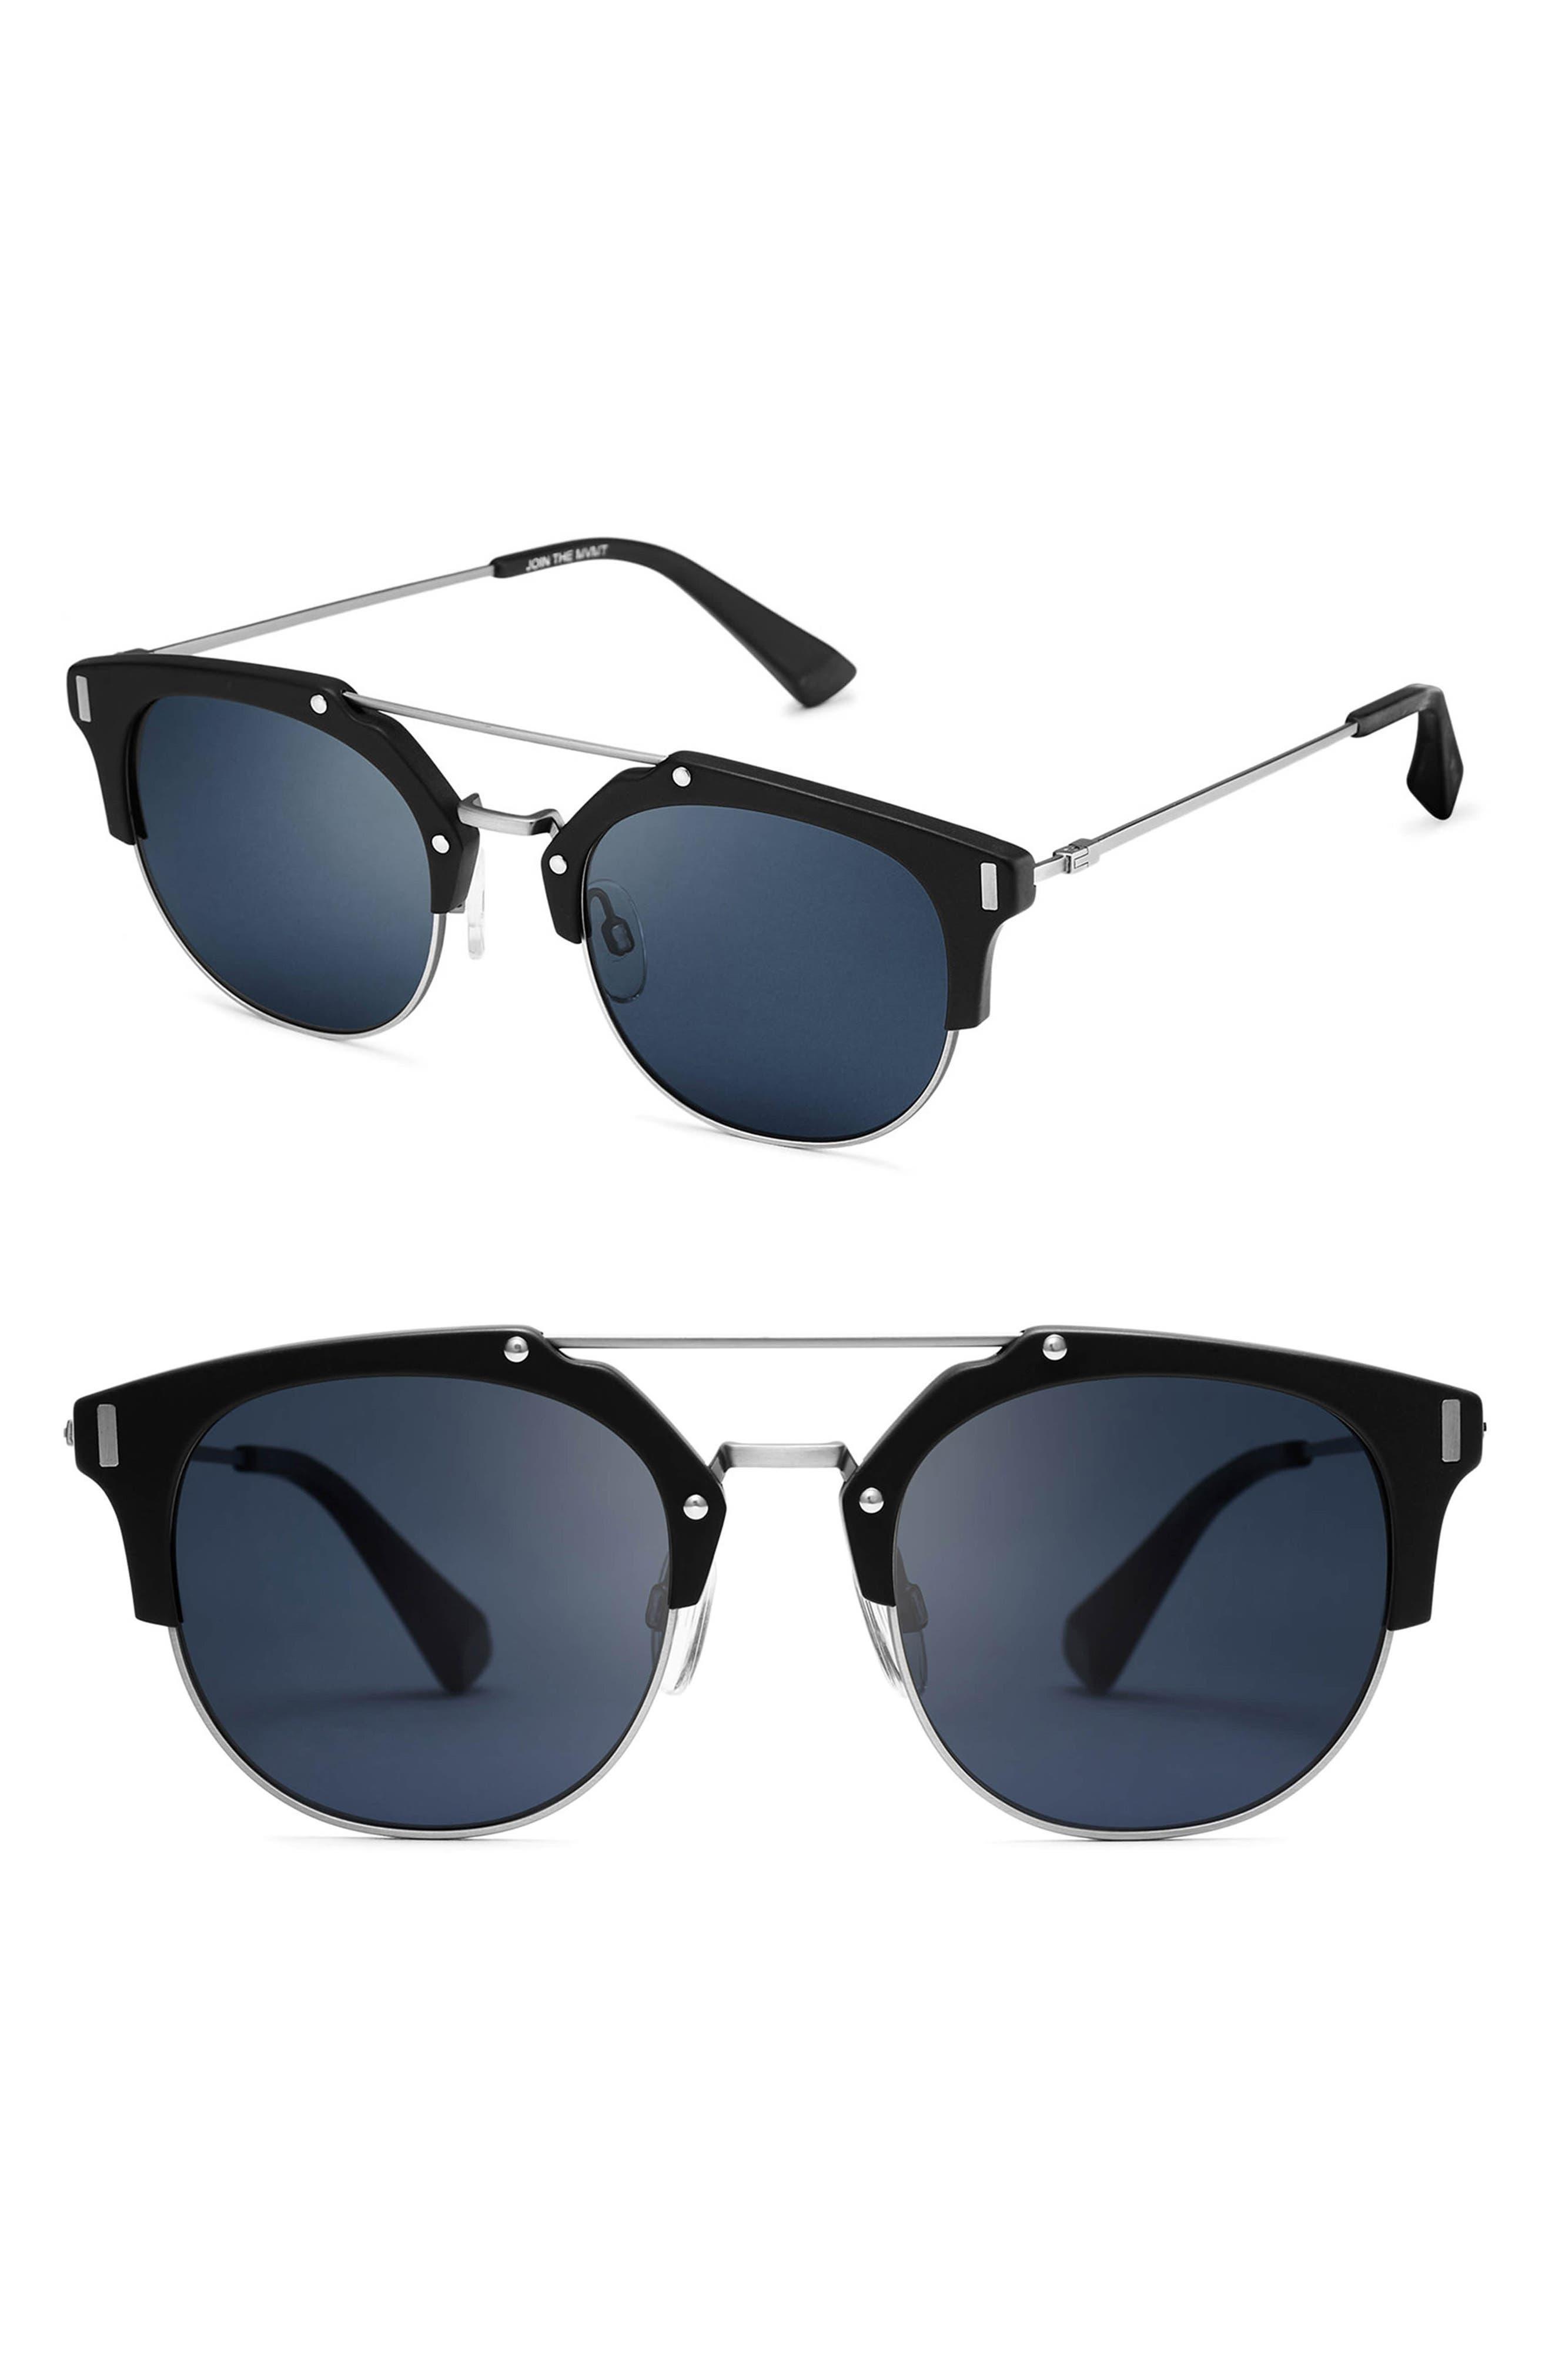 Weekend 51mm Sunglasses,                         Main,                         color, Matte Black